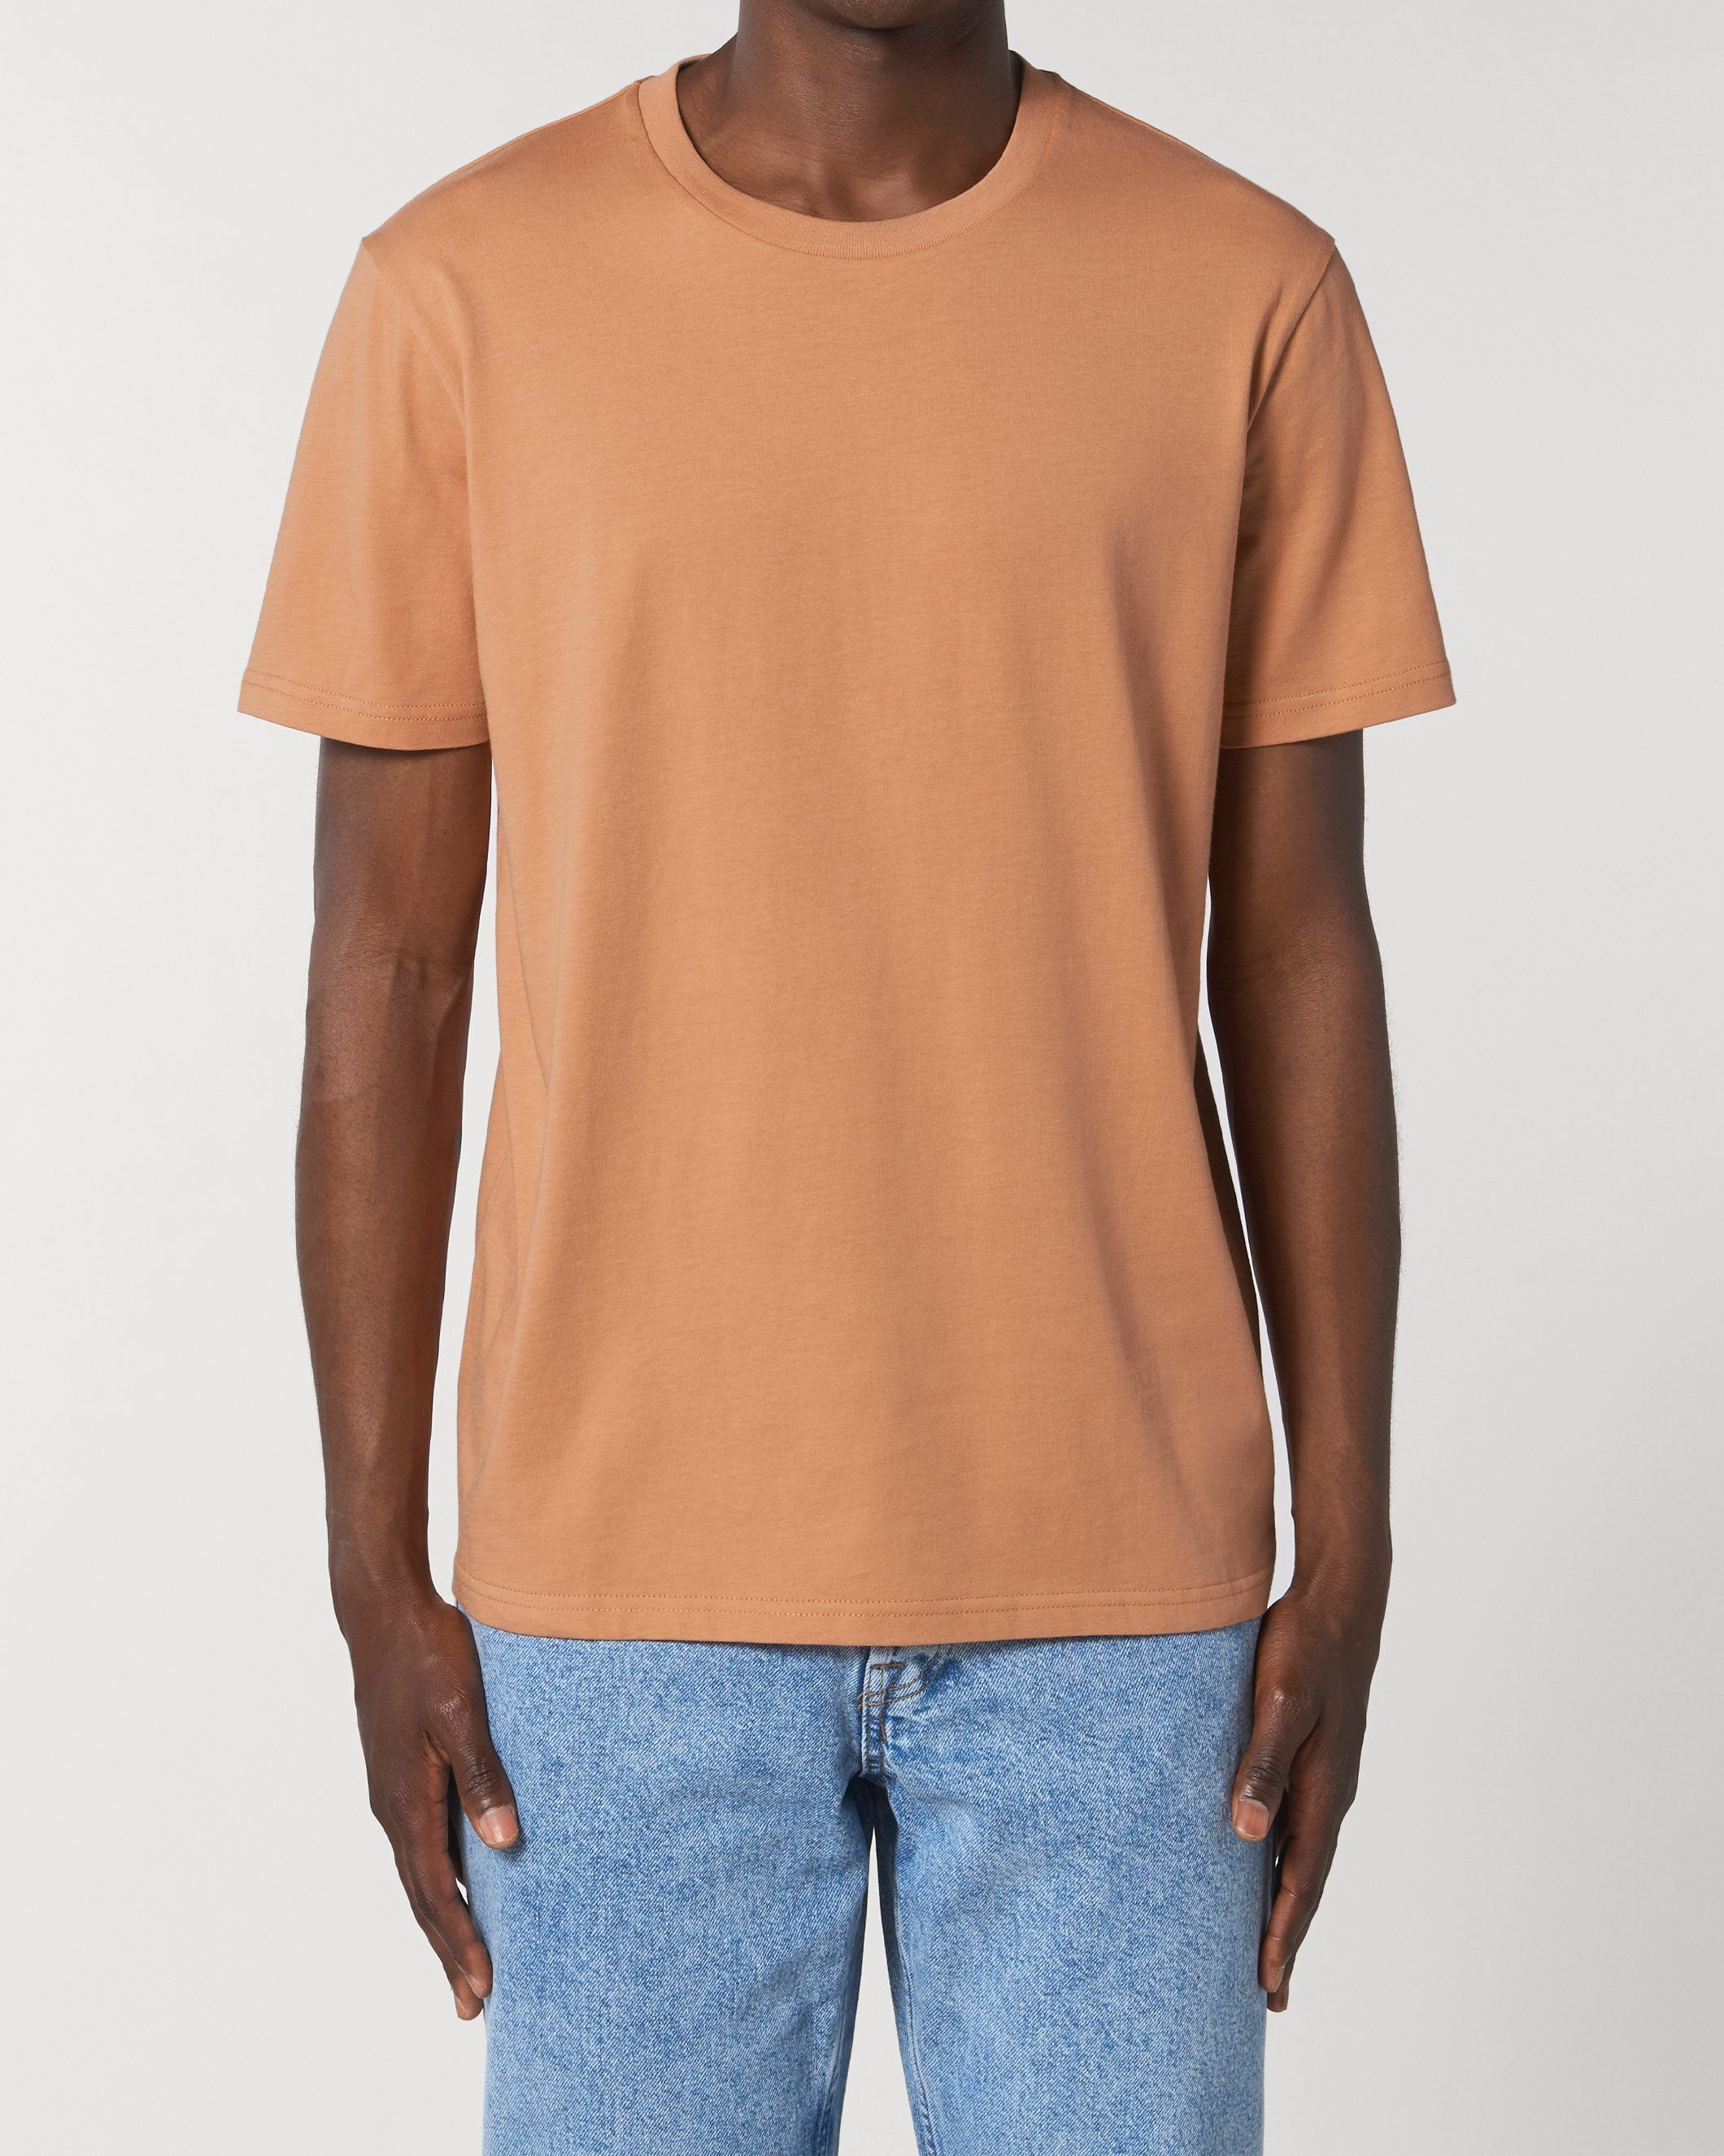 Nauli Unisex Regular Fit T-Shirt in Brown